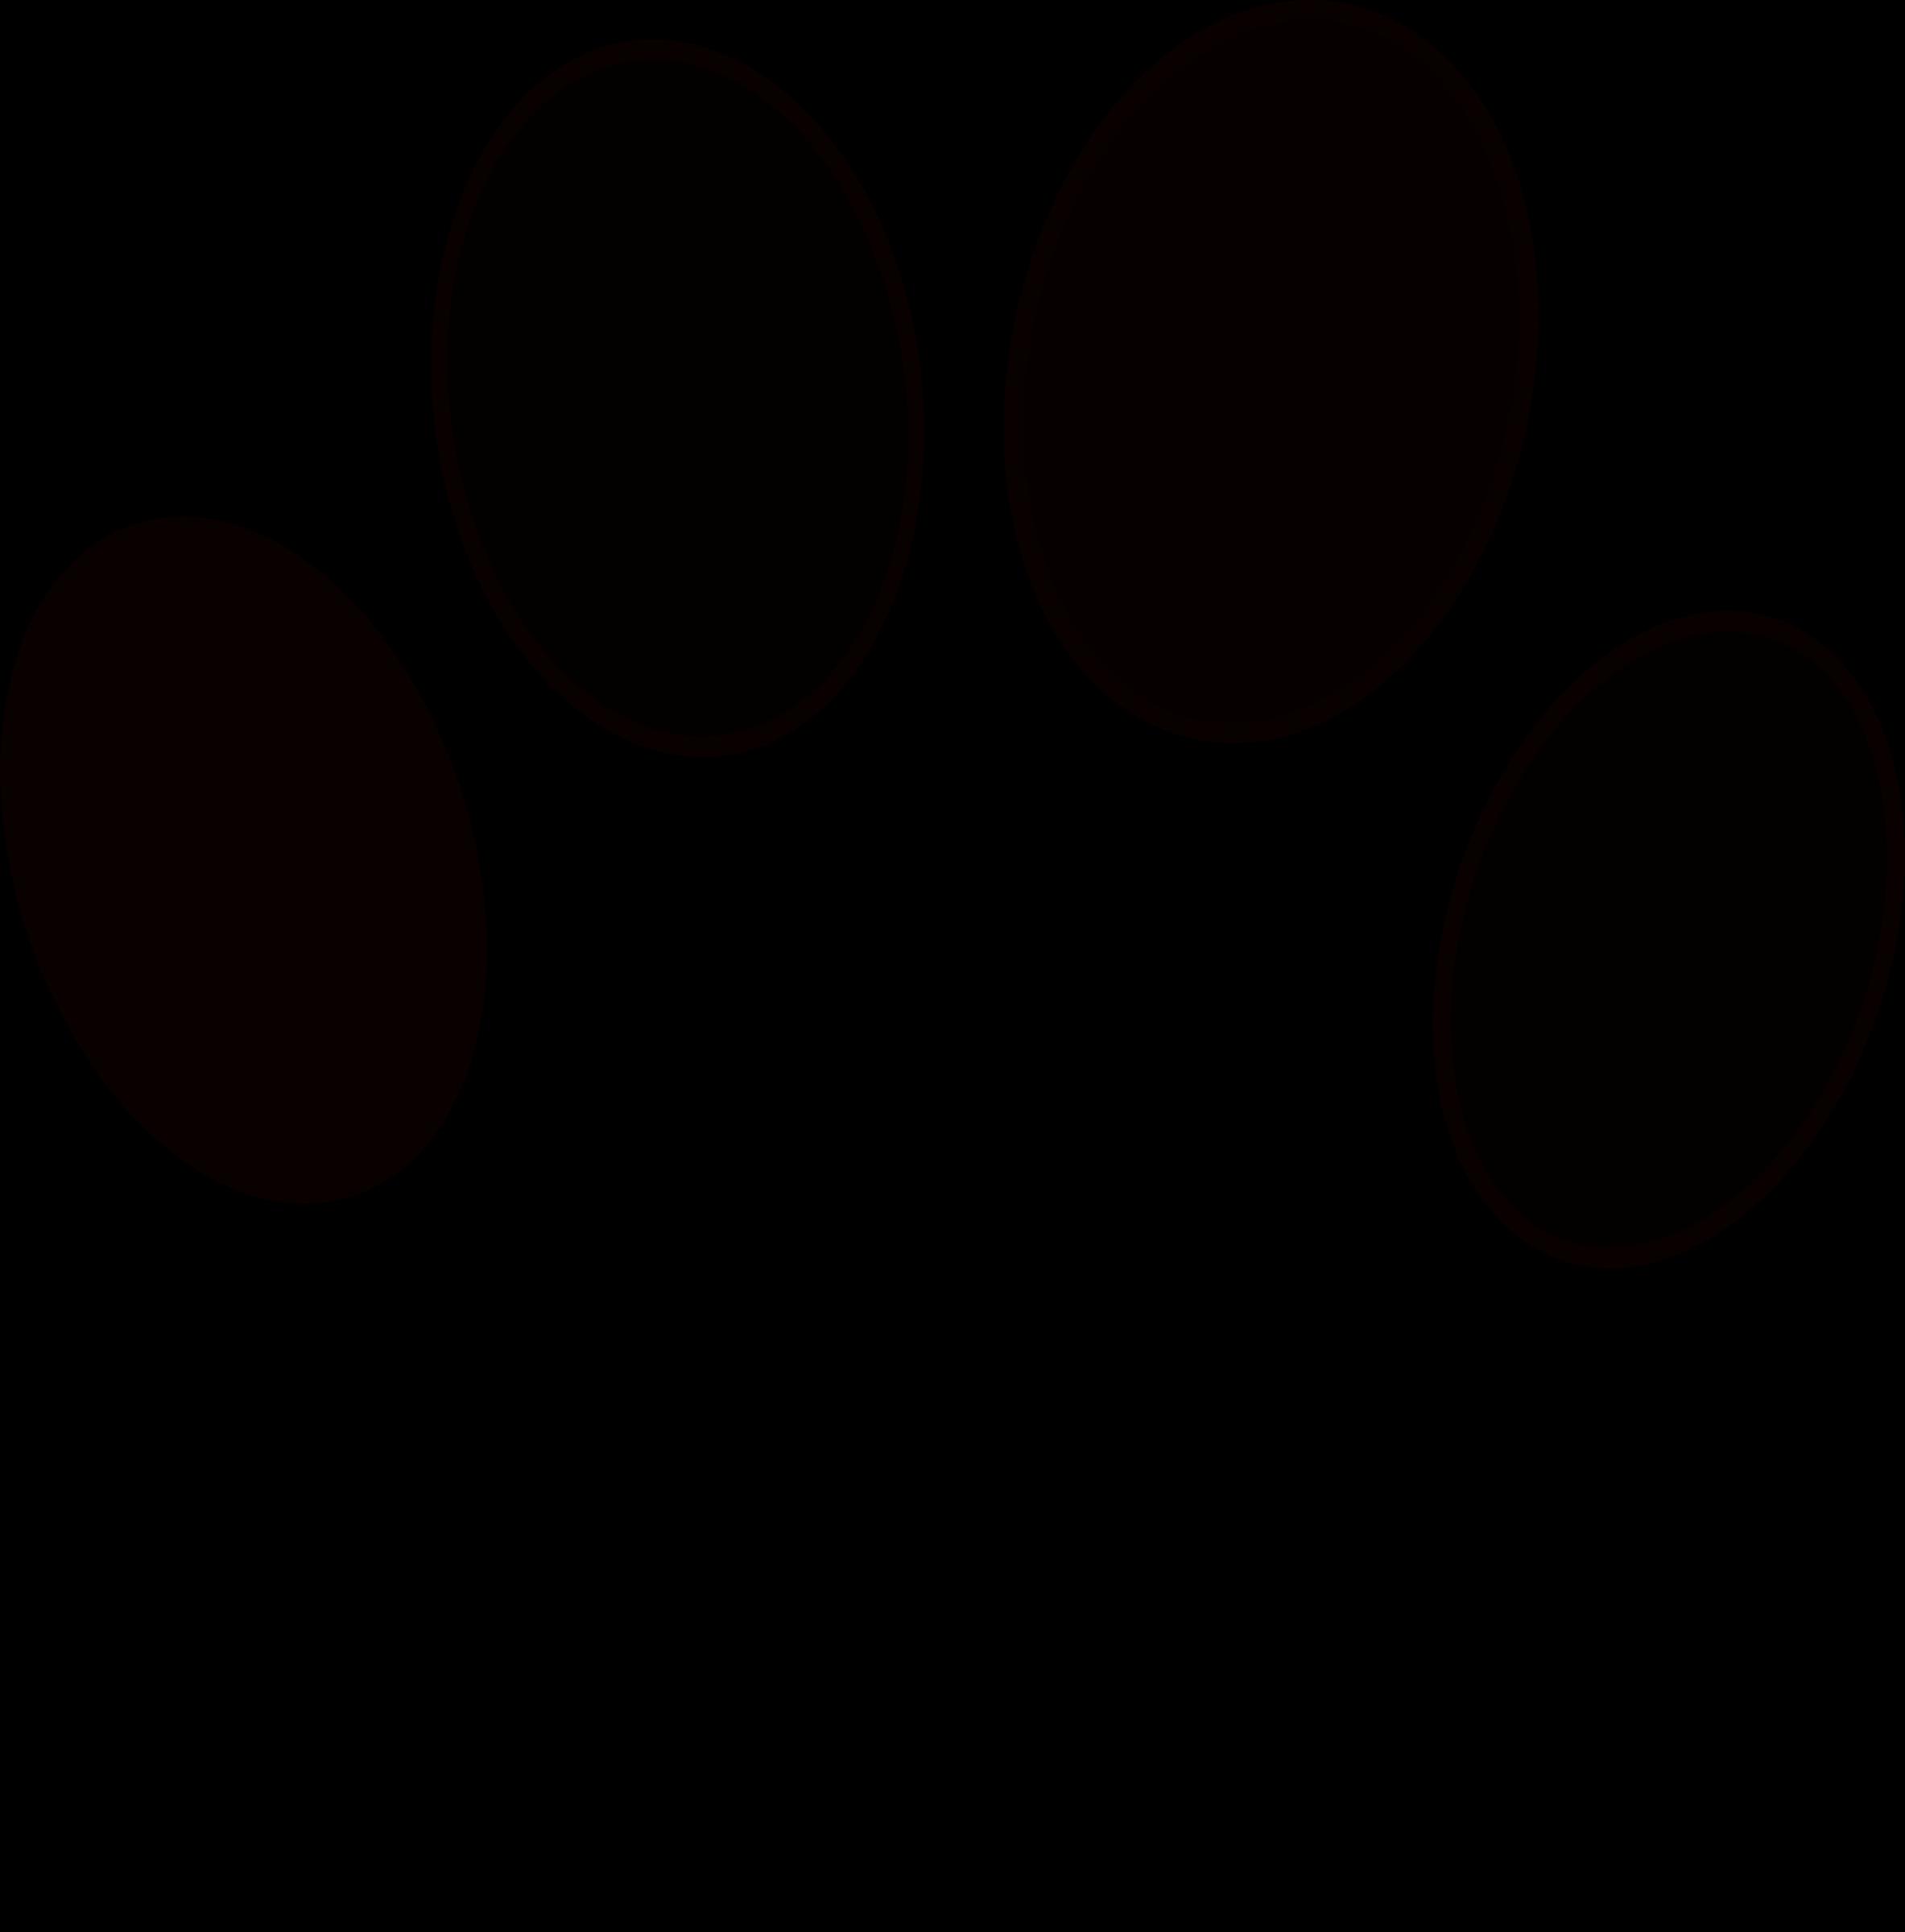 Husky dog clipart black and white graphic transparent Siberian Husky Paw Puppy Clip art - Huella De Perro 2366*2399 ... graphic transparent